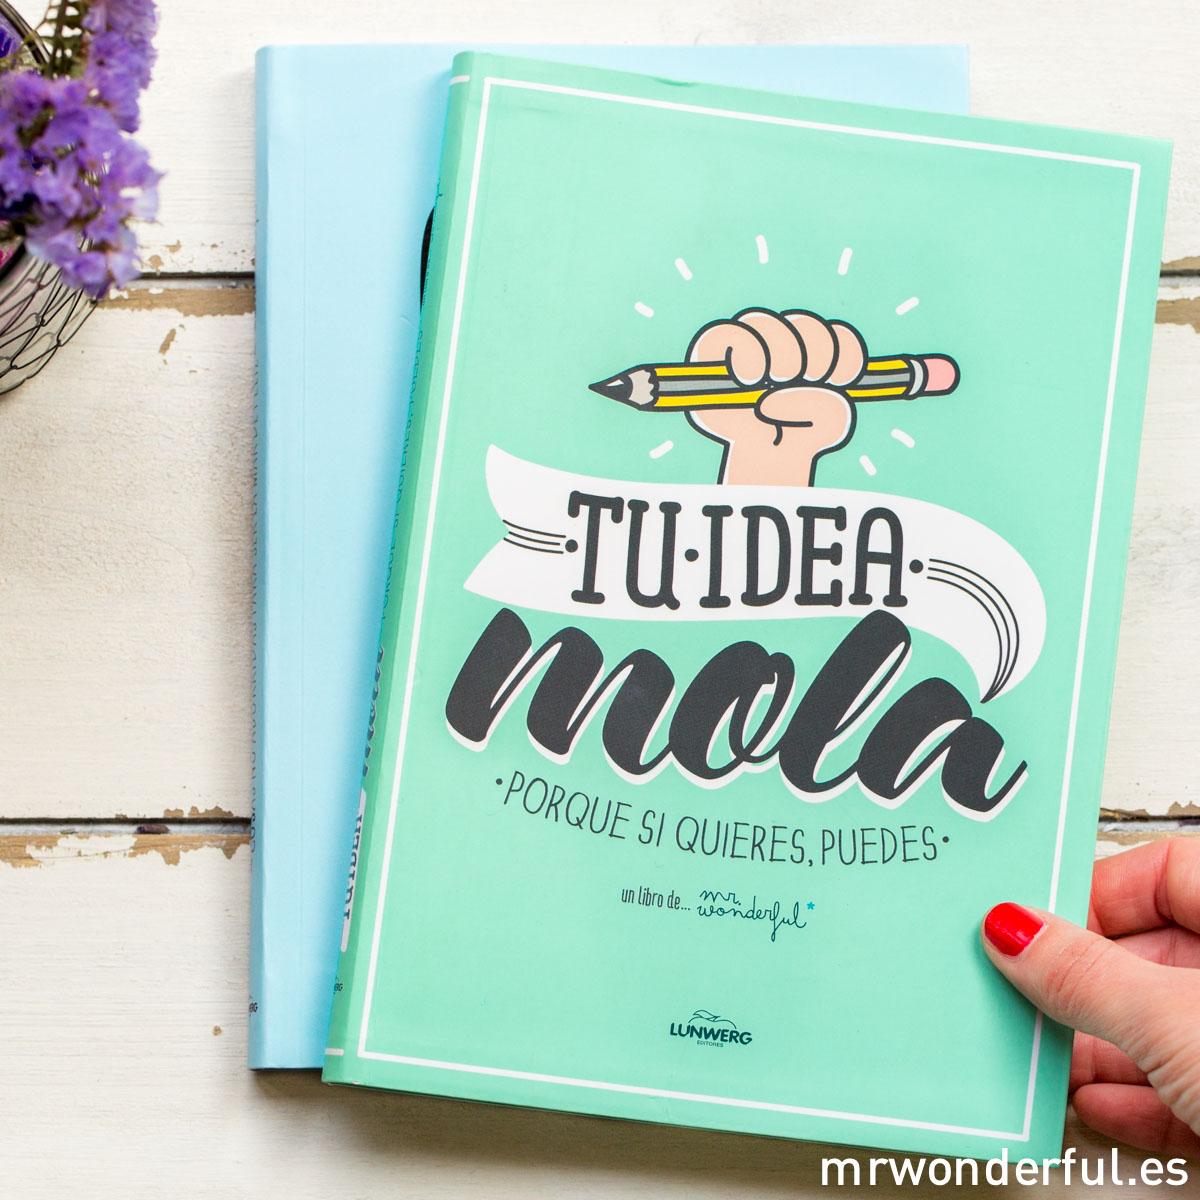 mrwonderful_libro-05_tu-idea-mola-25